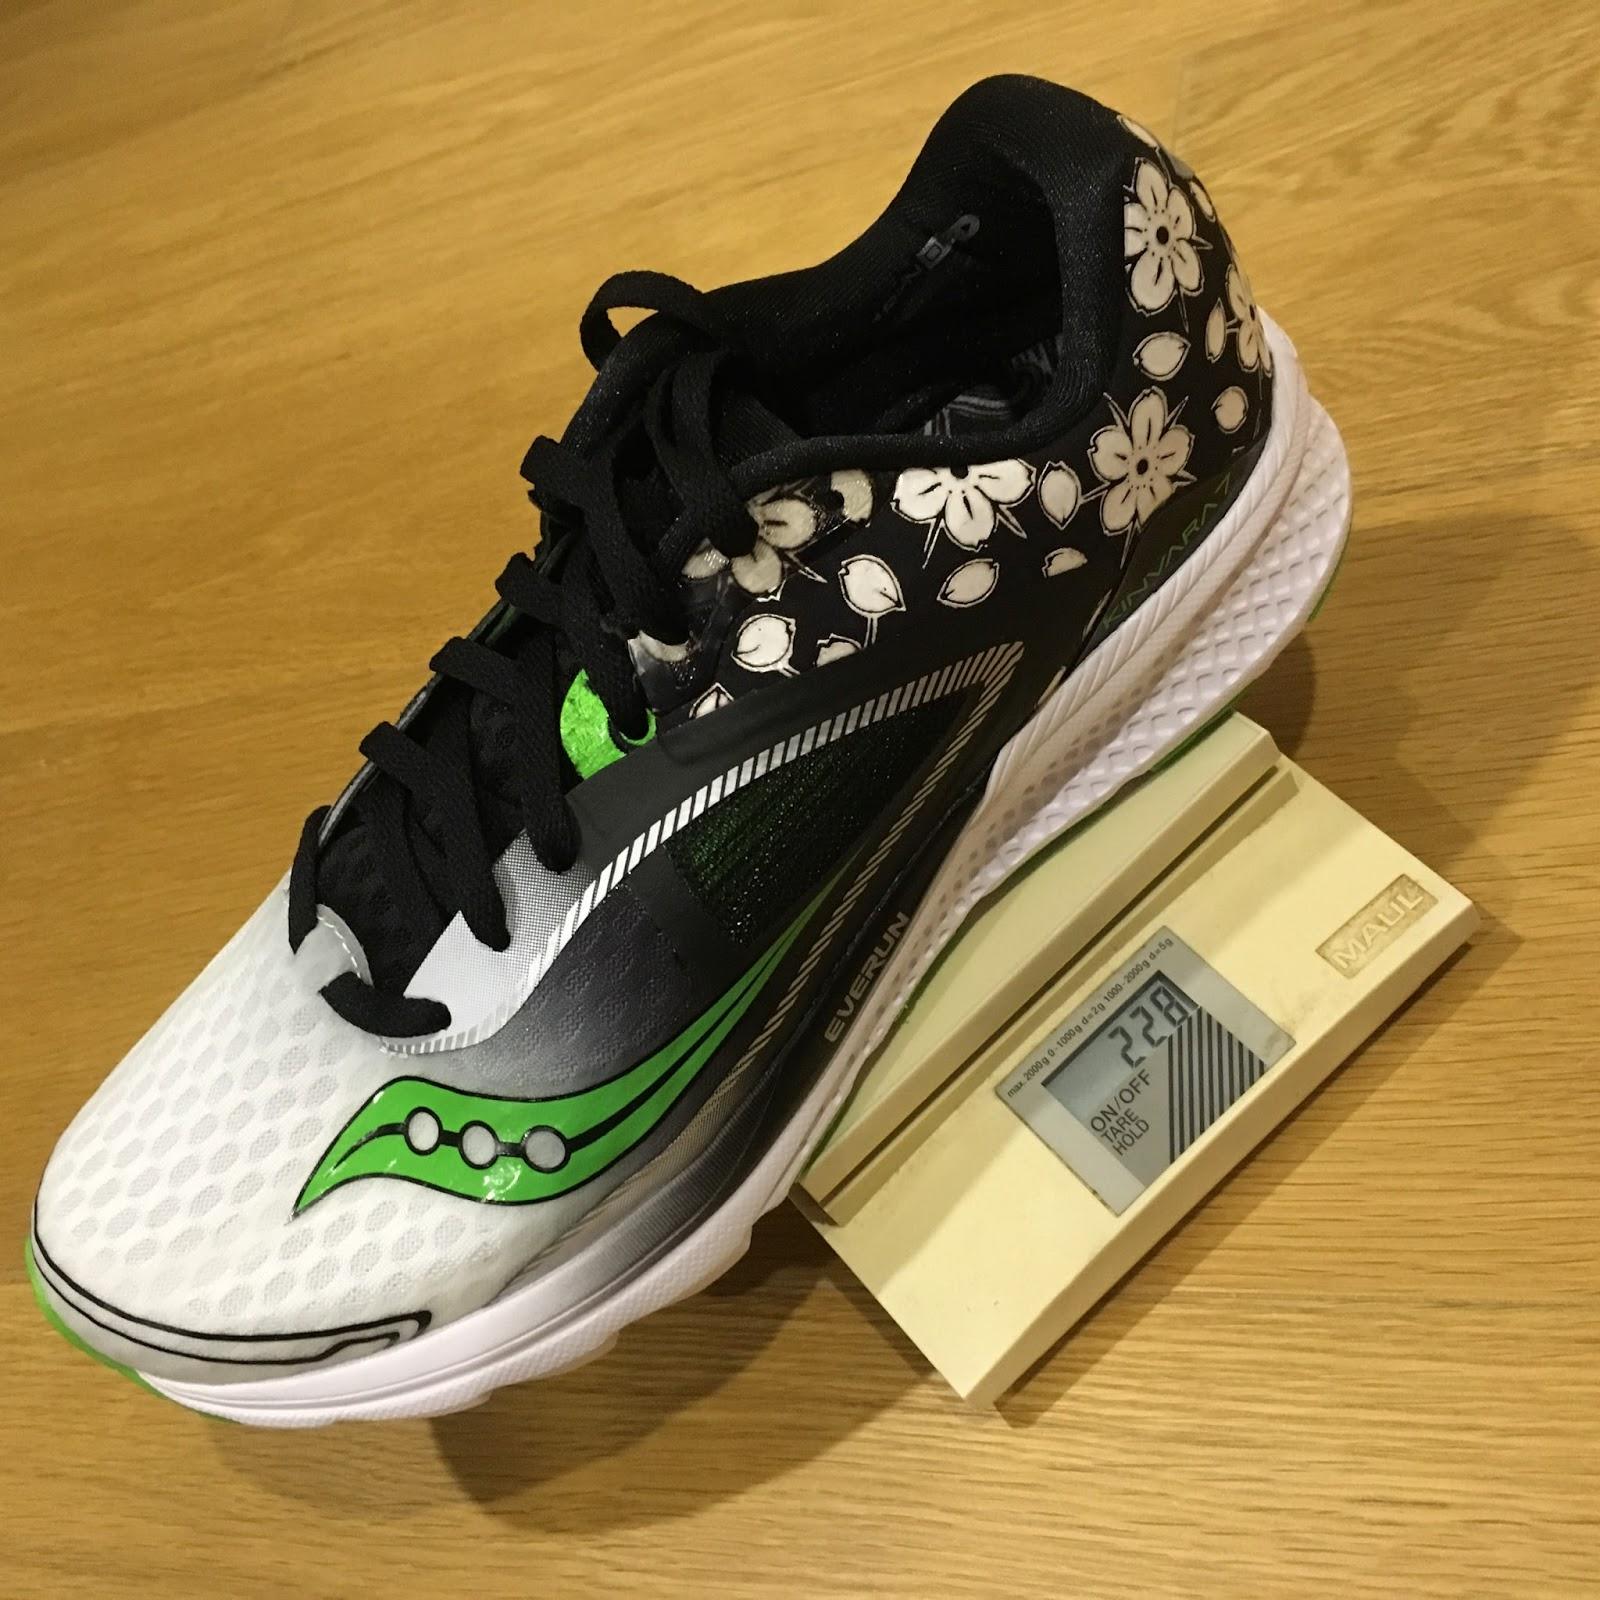 Tokyo Marathon Nike Shoes